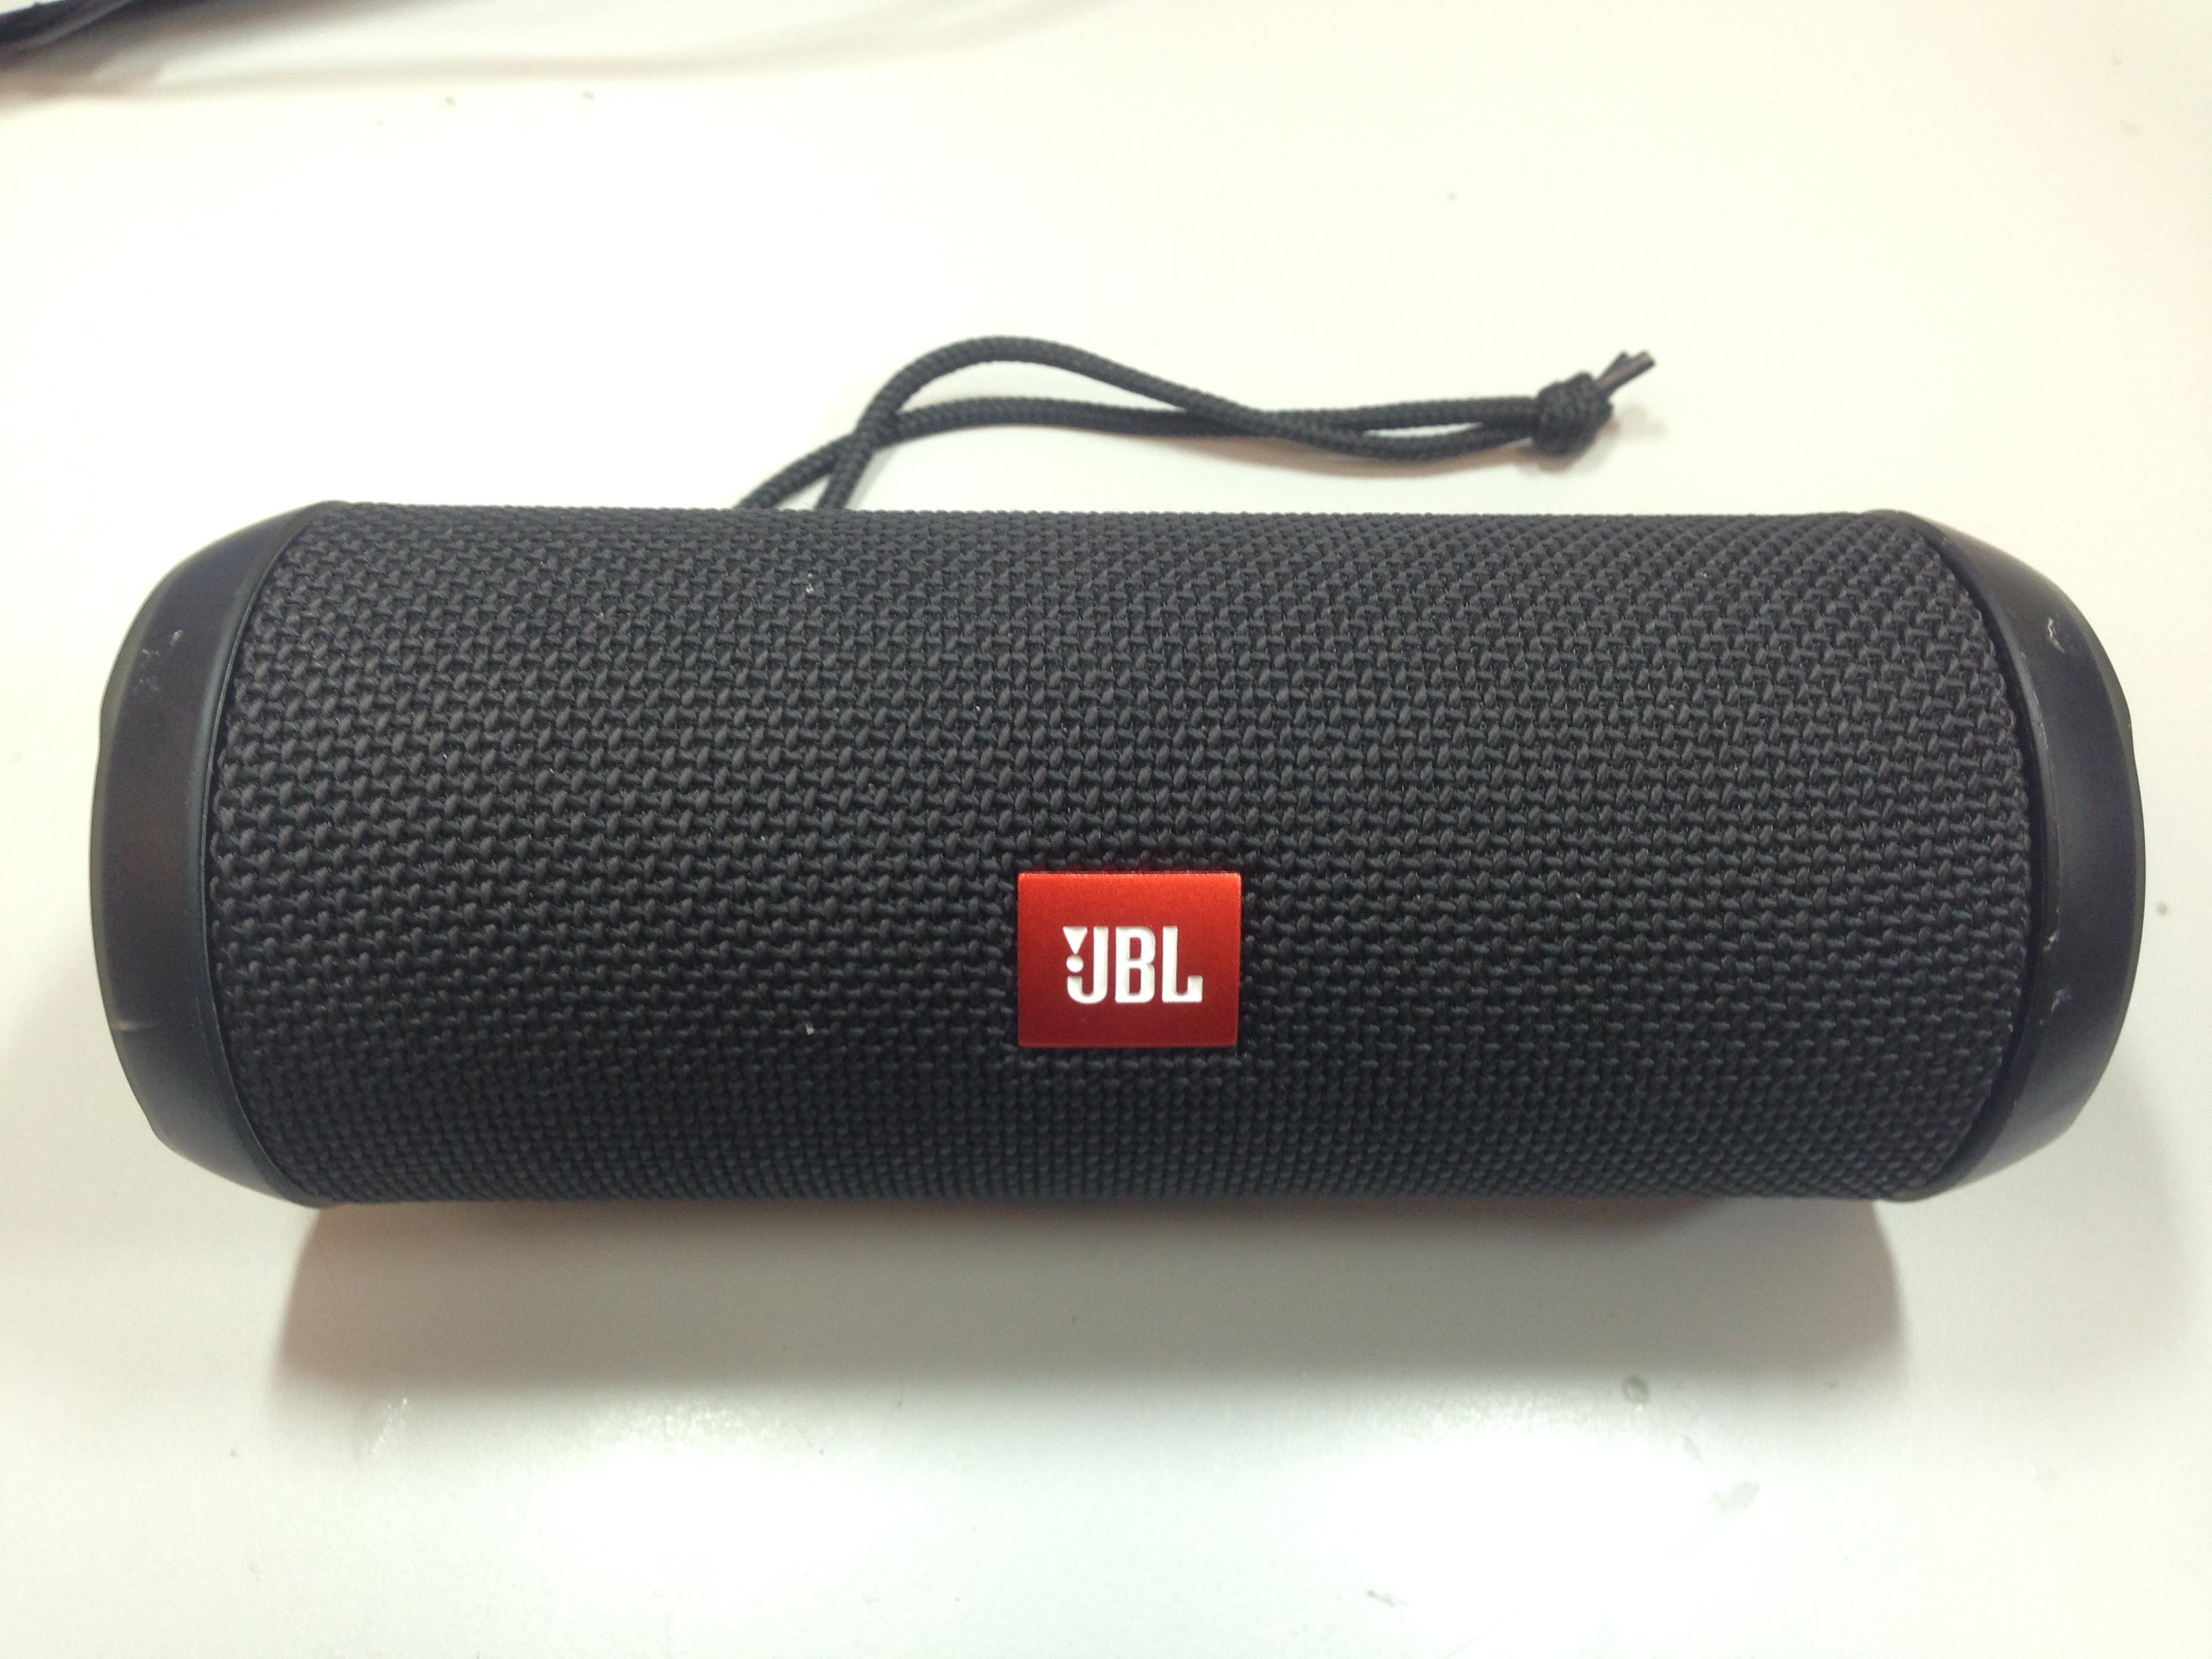 JBL Flip 3 Repair - iFixit